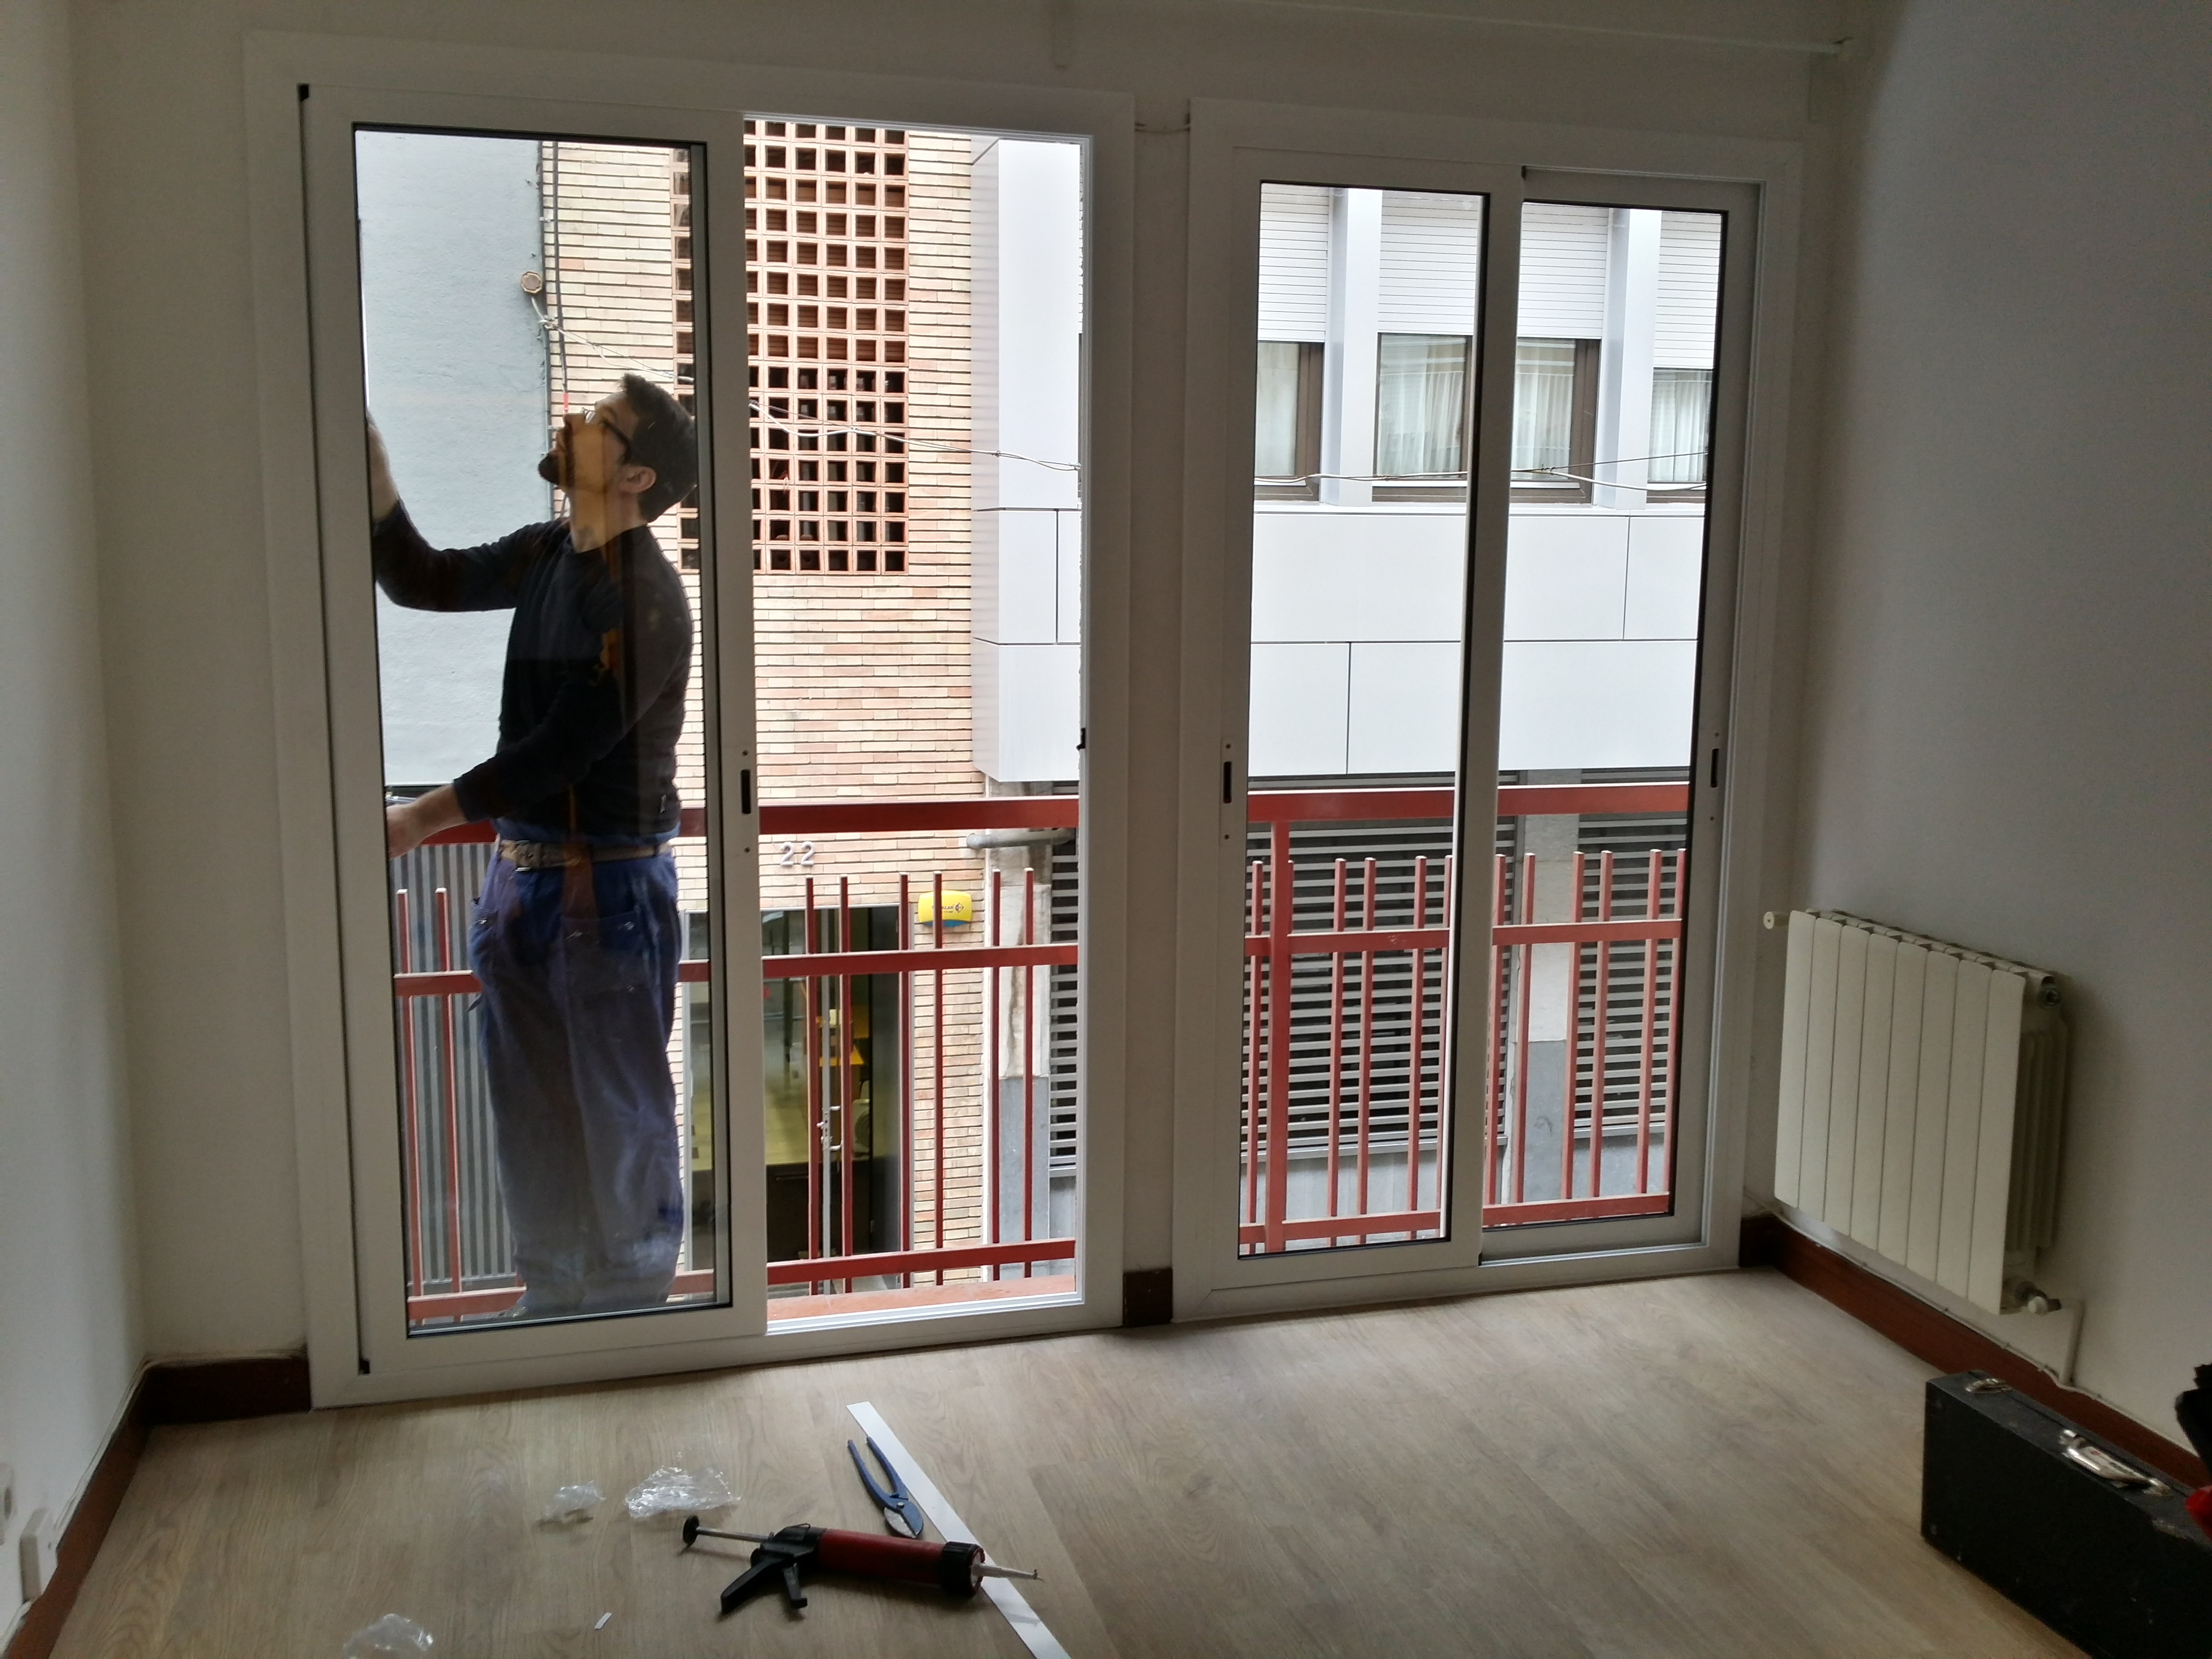 #7B6450 70 Aluminium Sliding Doors Series on balcony in Sarrià quarter in  668 Janelas Pvc Oscilo Batentes